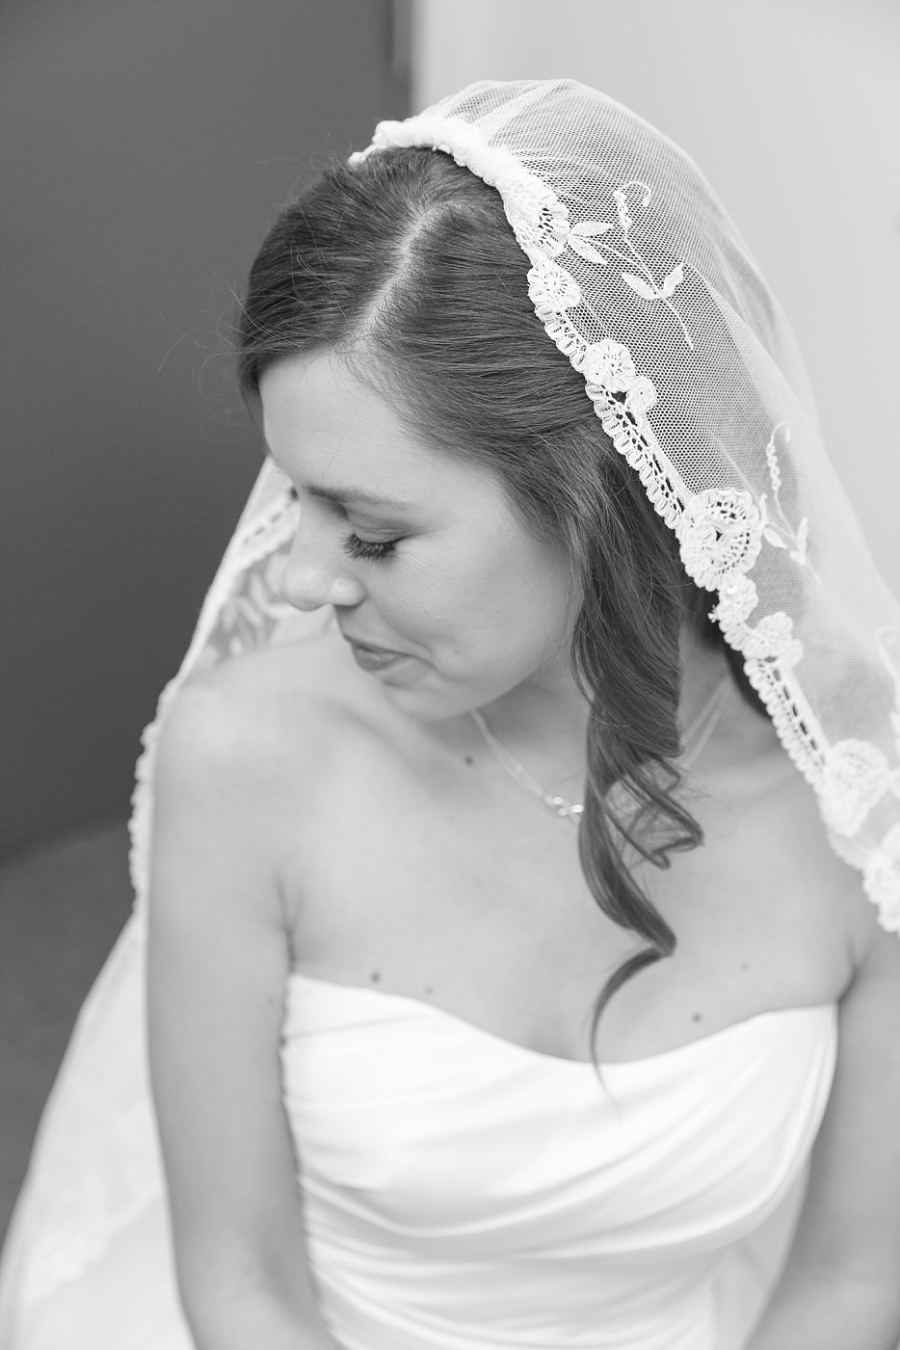 Stacy-Anderson-Photography-McGovern-Centennial-Gardens-Houston-Wedding-Photographer_0015.jpg